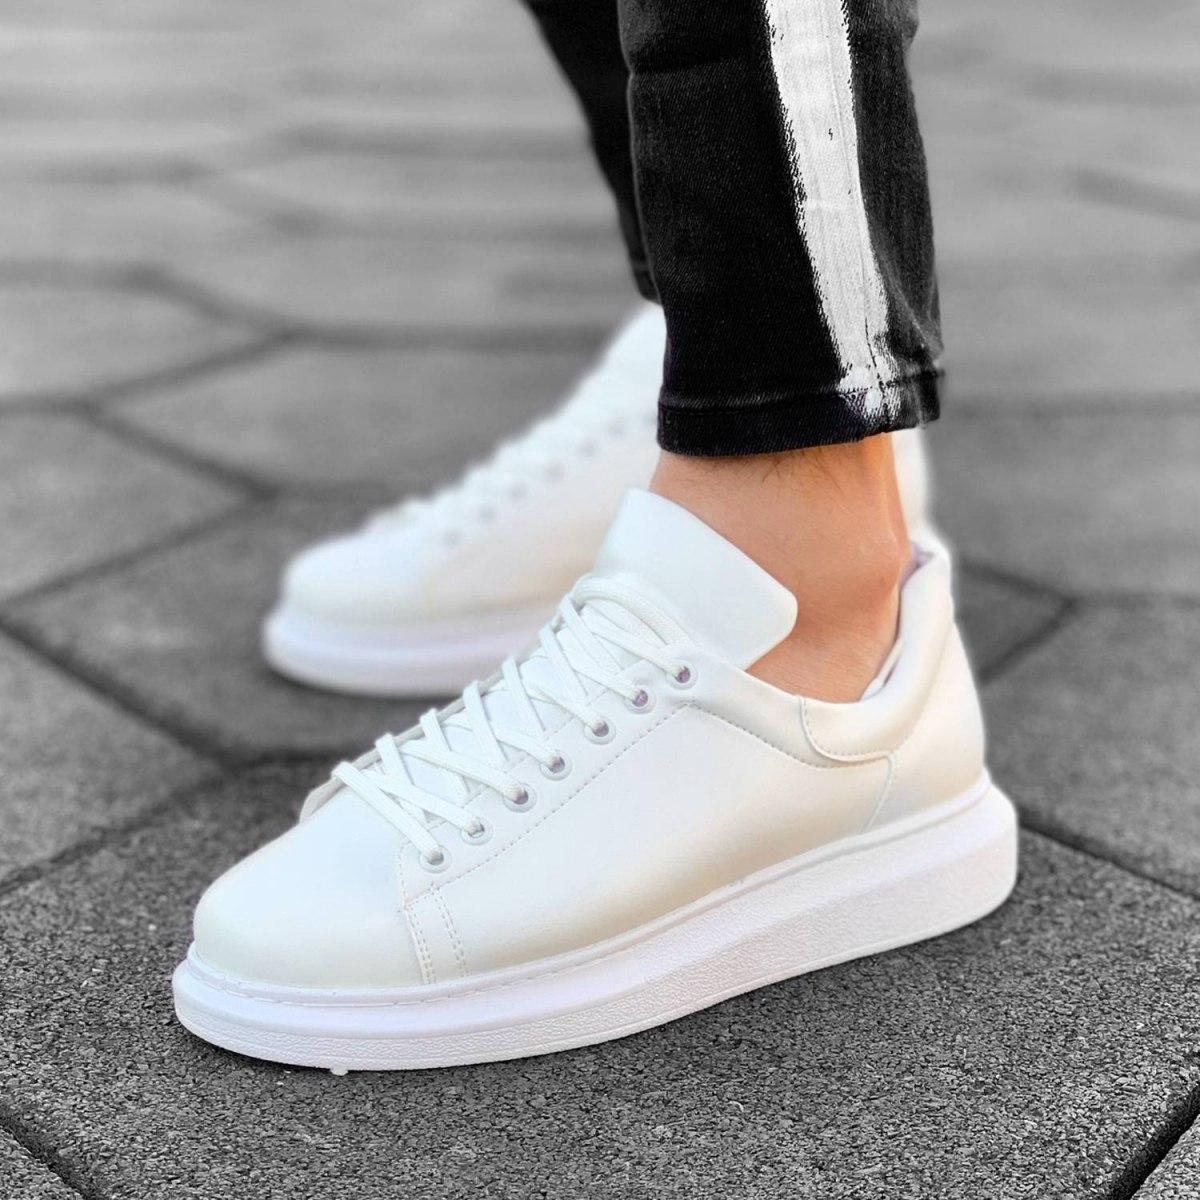 MV Whiteout Mega Sole Sneaker